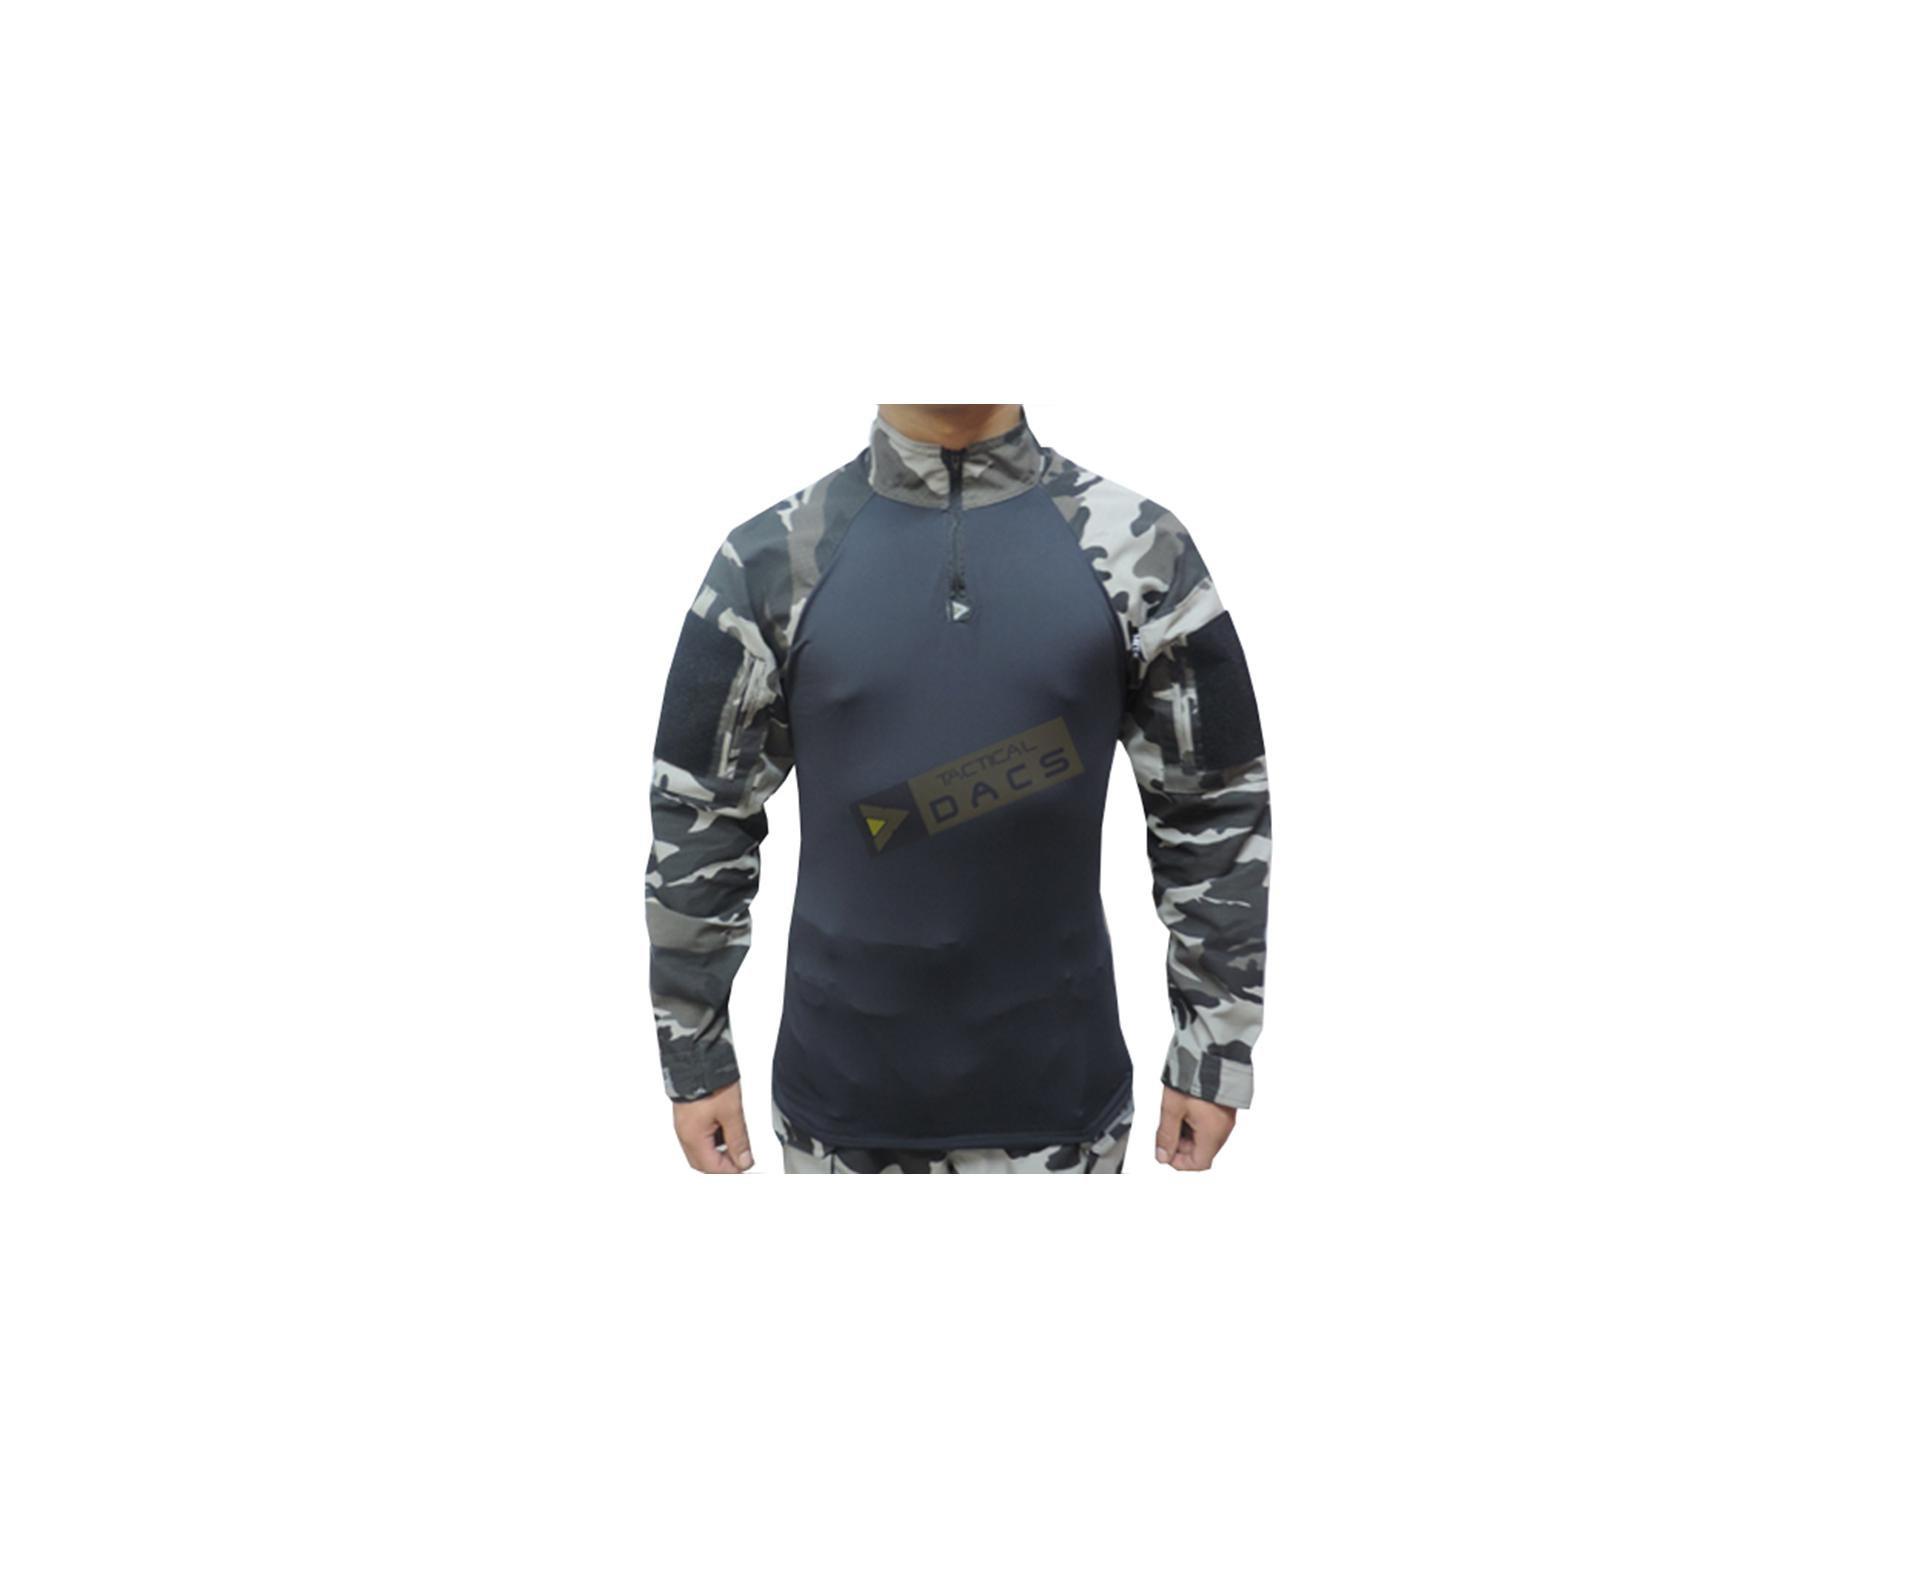 Camisa Combat Shirt Hrt - Urbano Black - Dacs